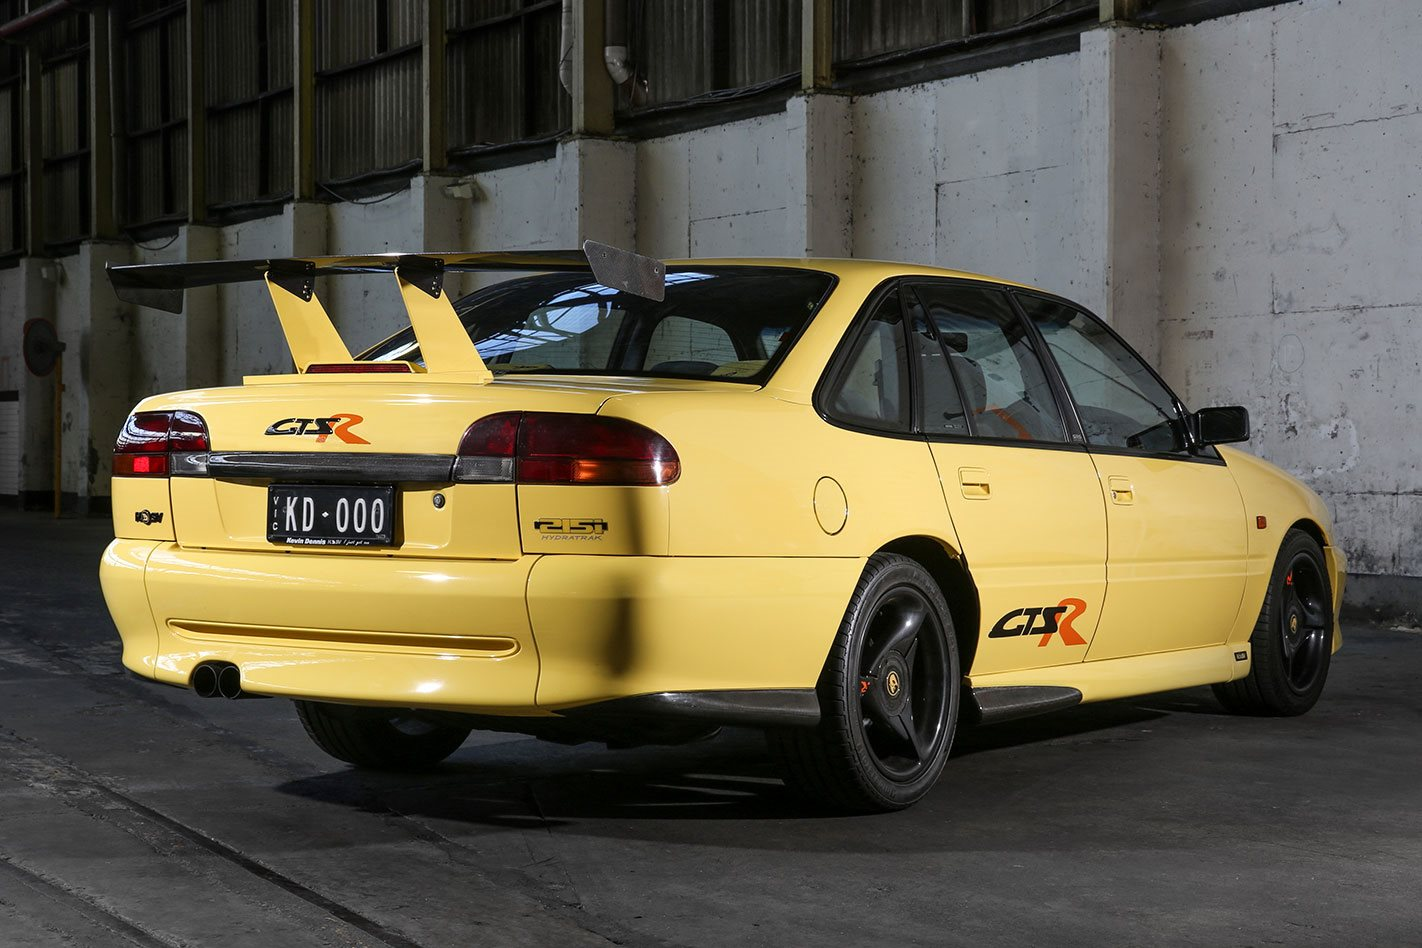 GTS R Rear